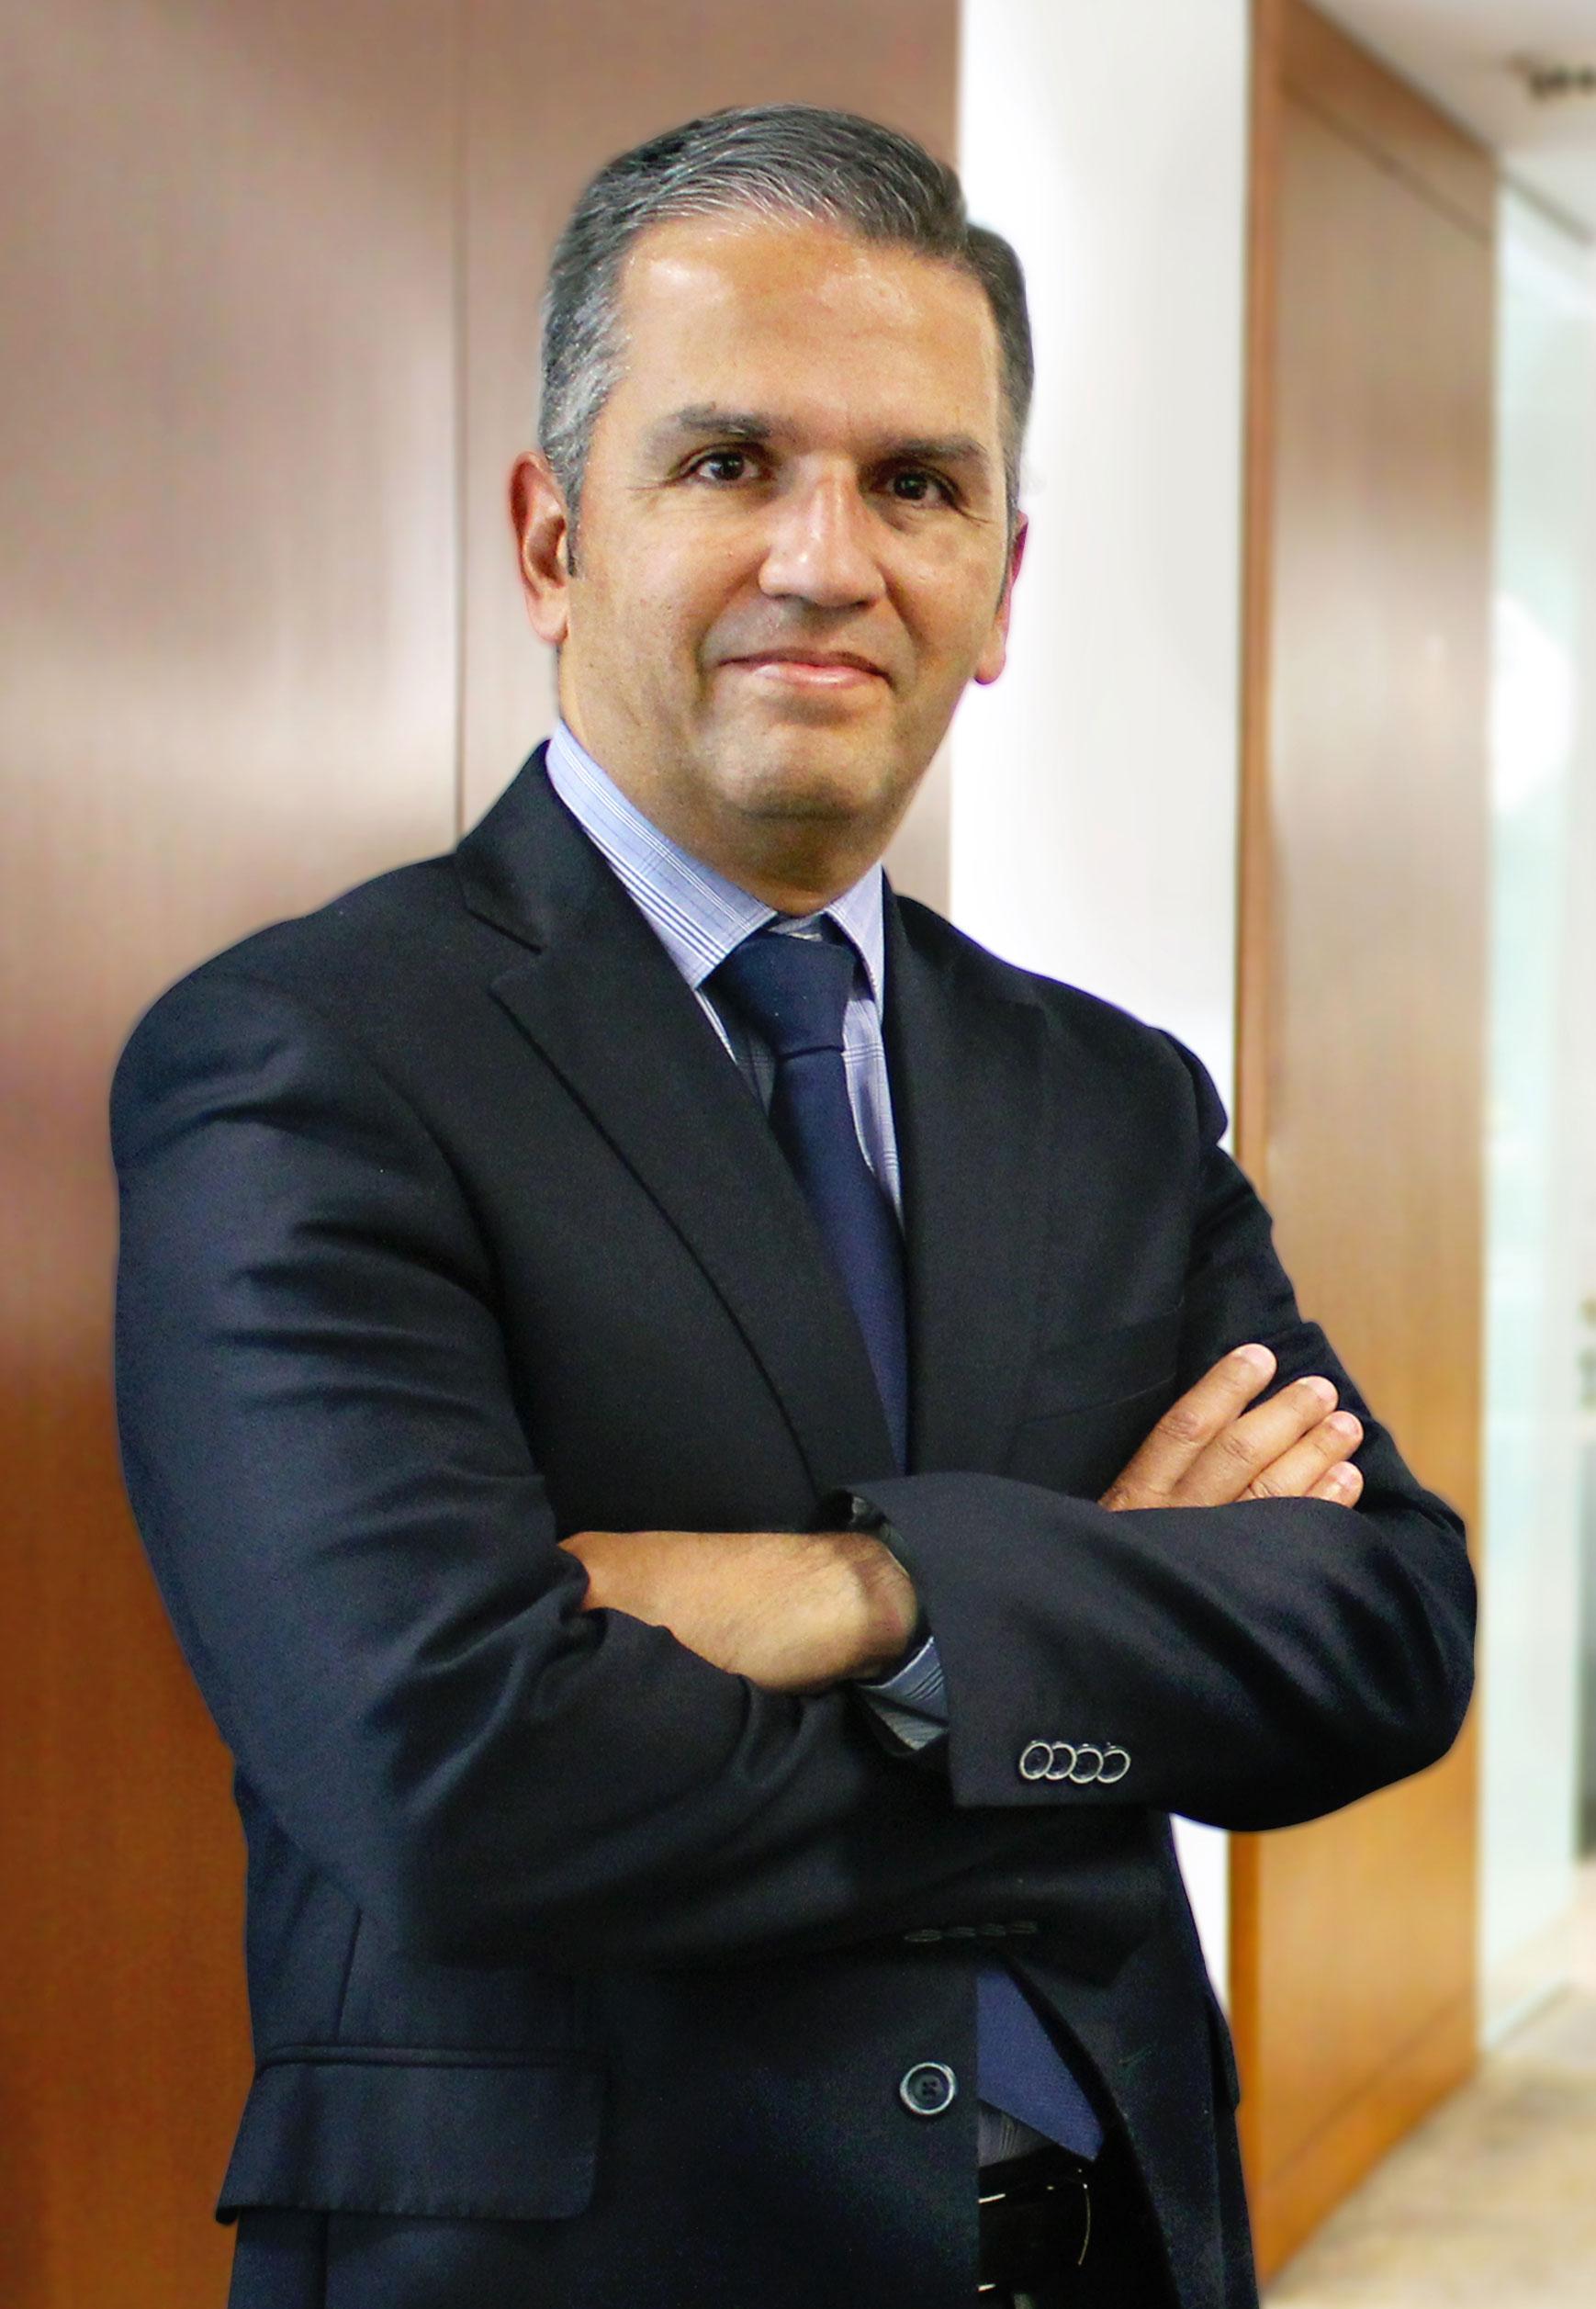 Rodolfo Campuzano